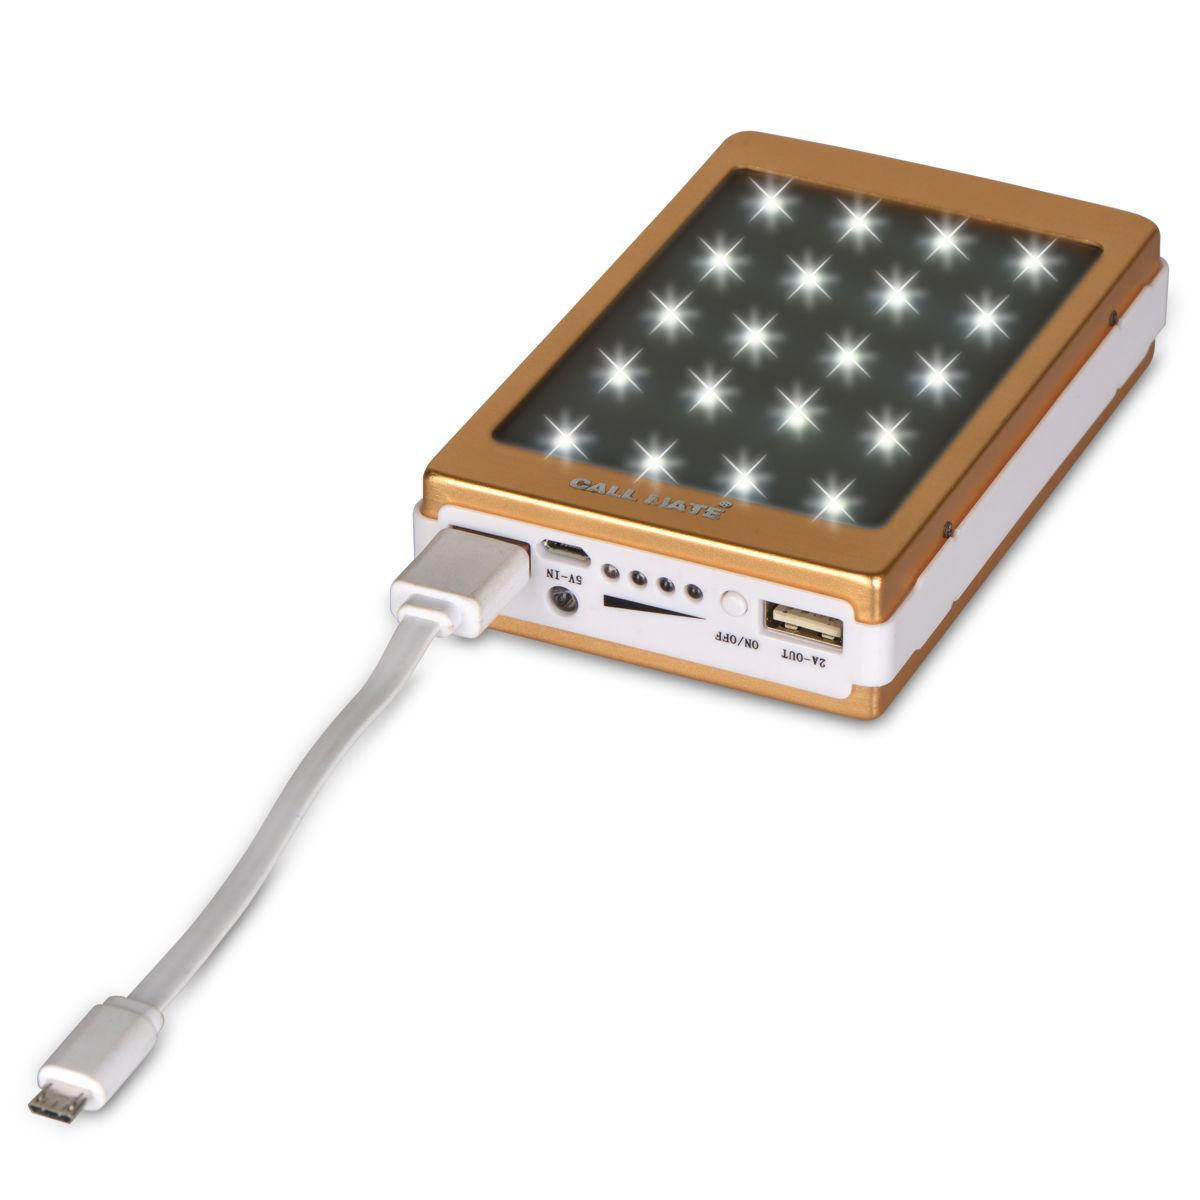 Buy Callmate 10000 mAh Solar Power Bank with Emergency ...